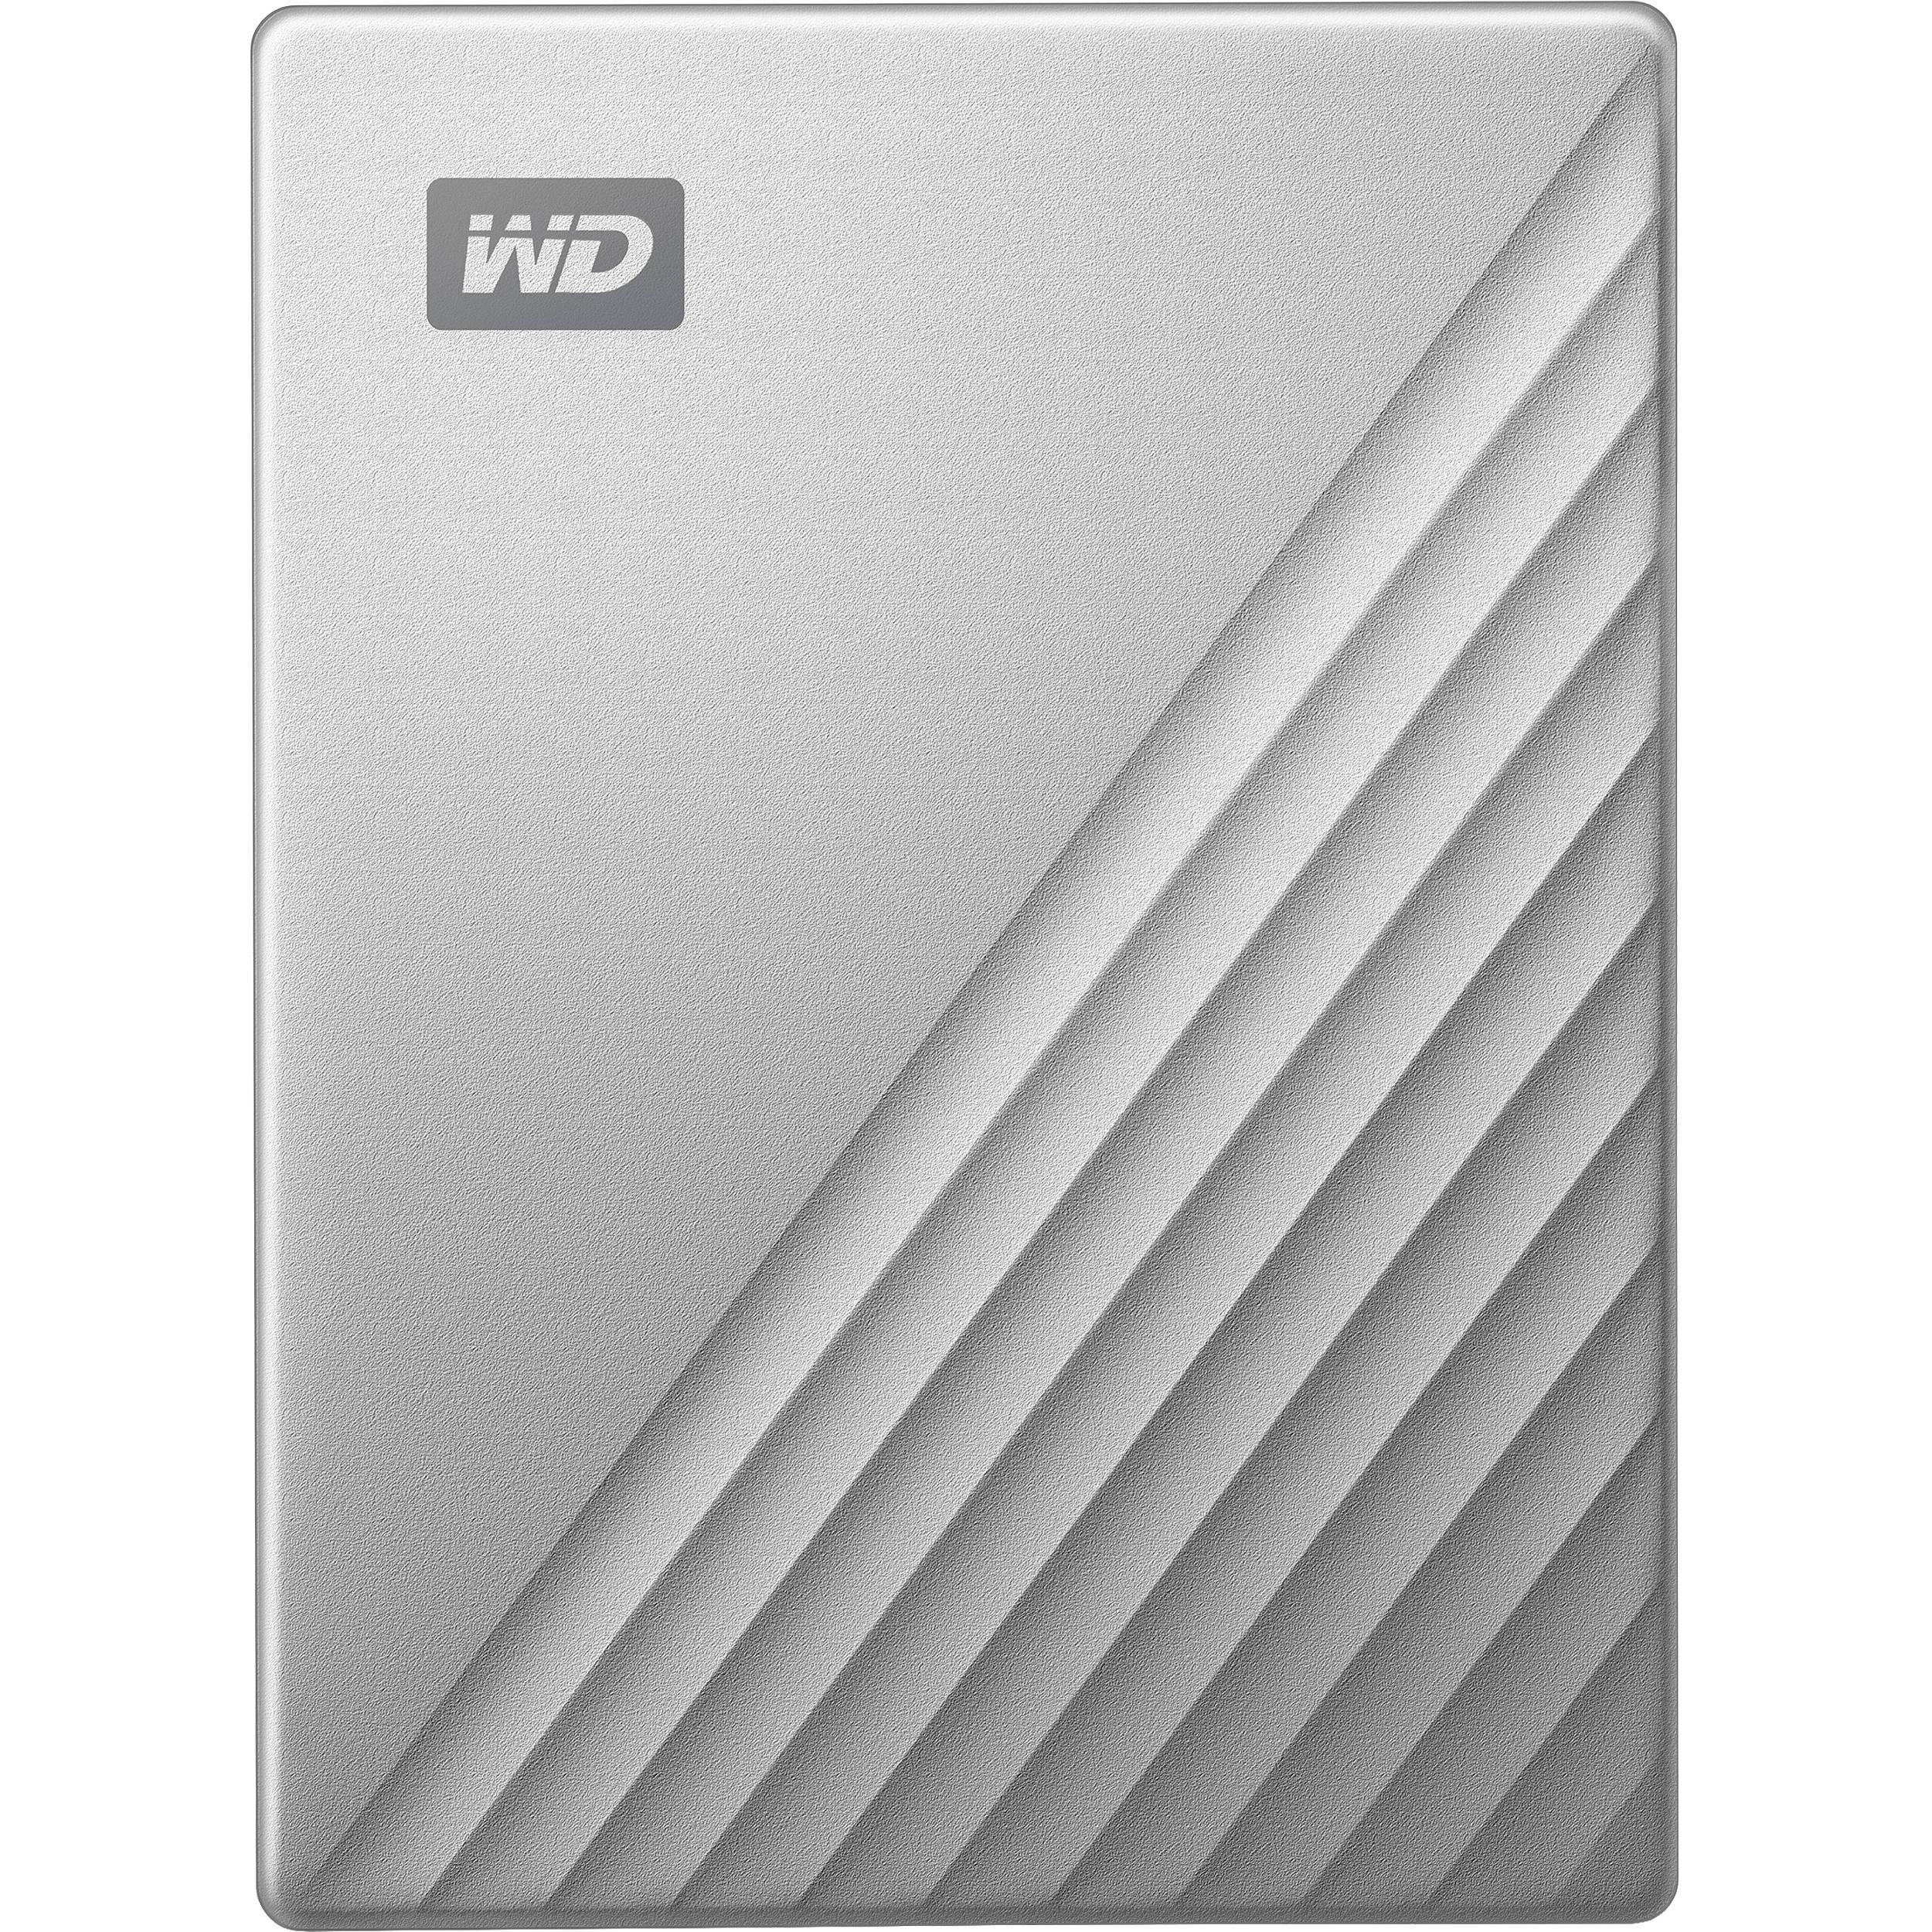 WD 4TB My Passport Ultra USB 3 0 Type-C External Hard Drive (Silver)